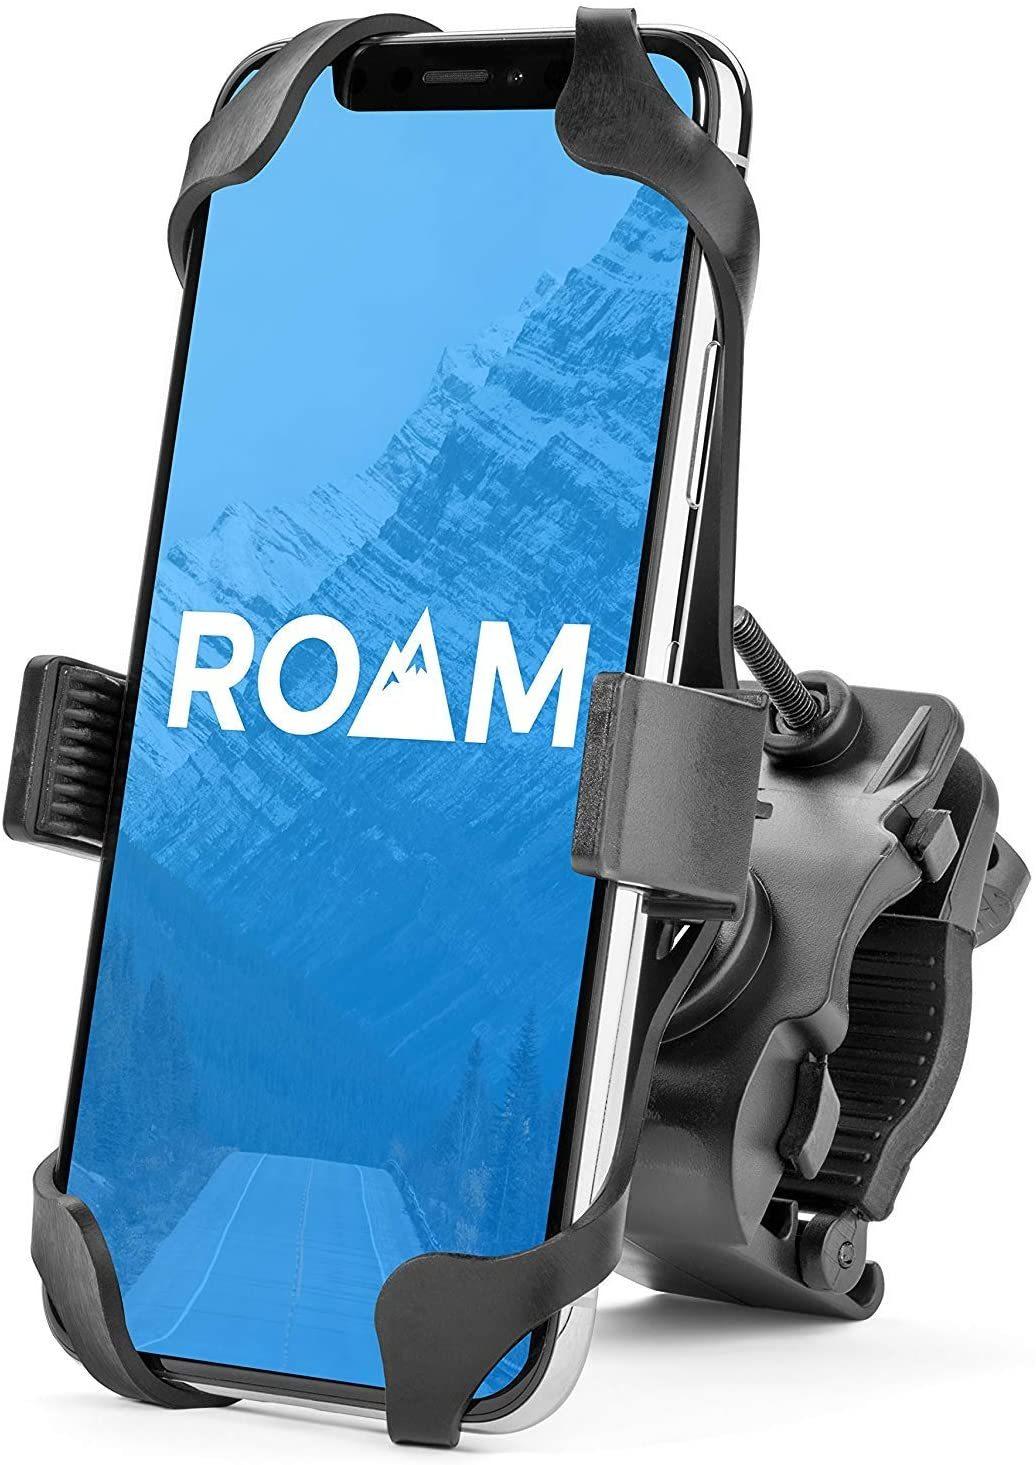 Roam-Universal-Premium-Bike-Phone-Mount-for-Motorcycle